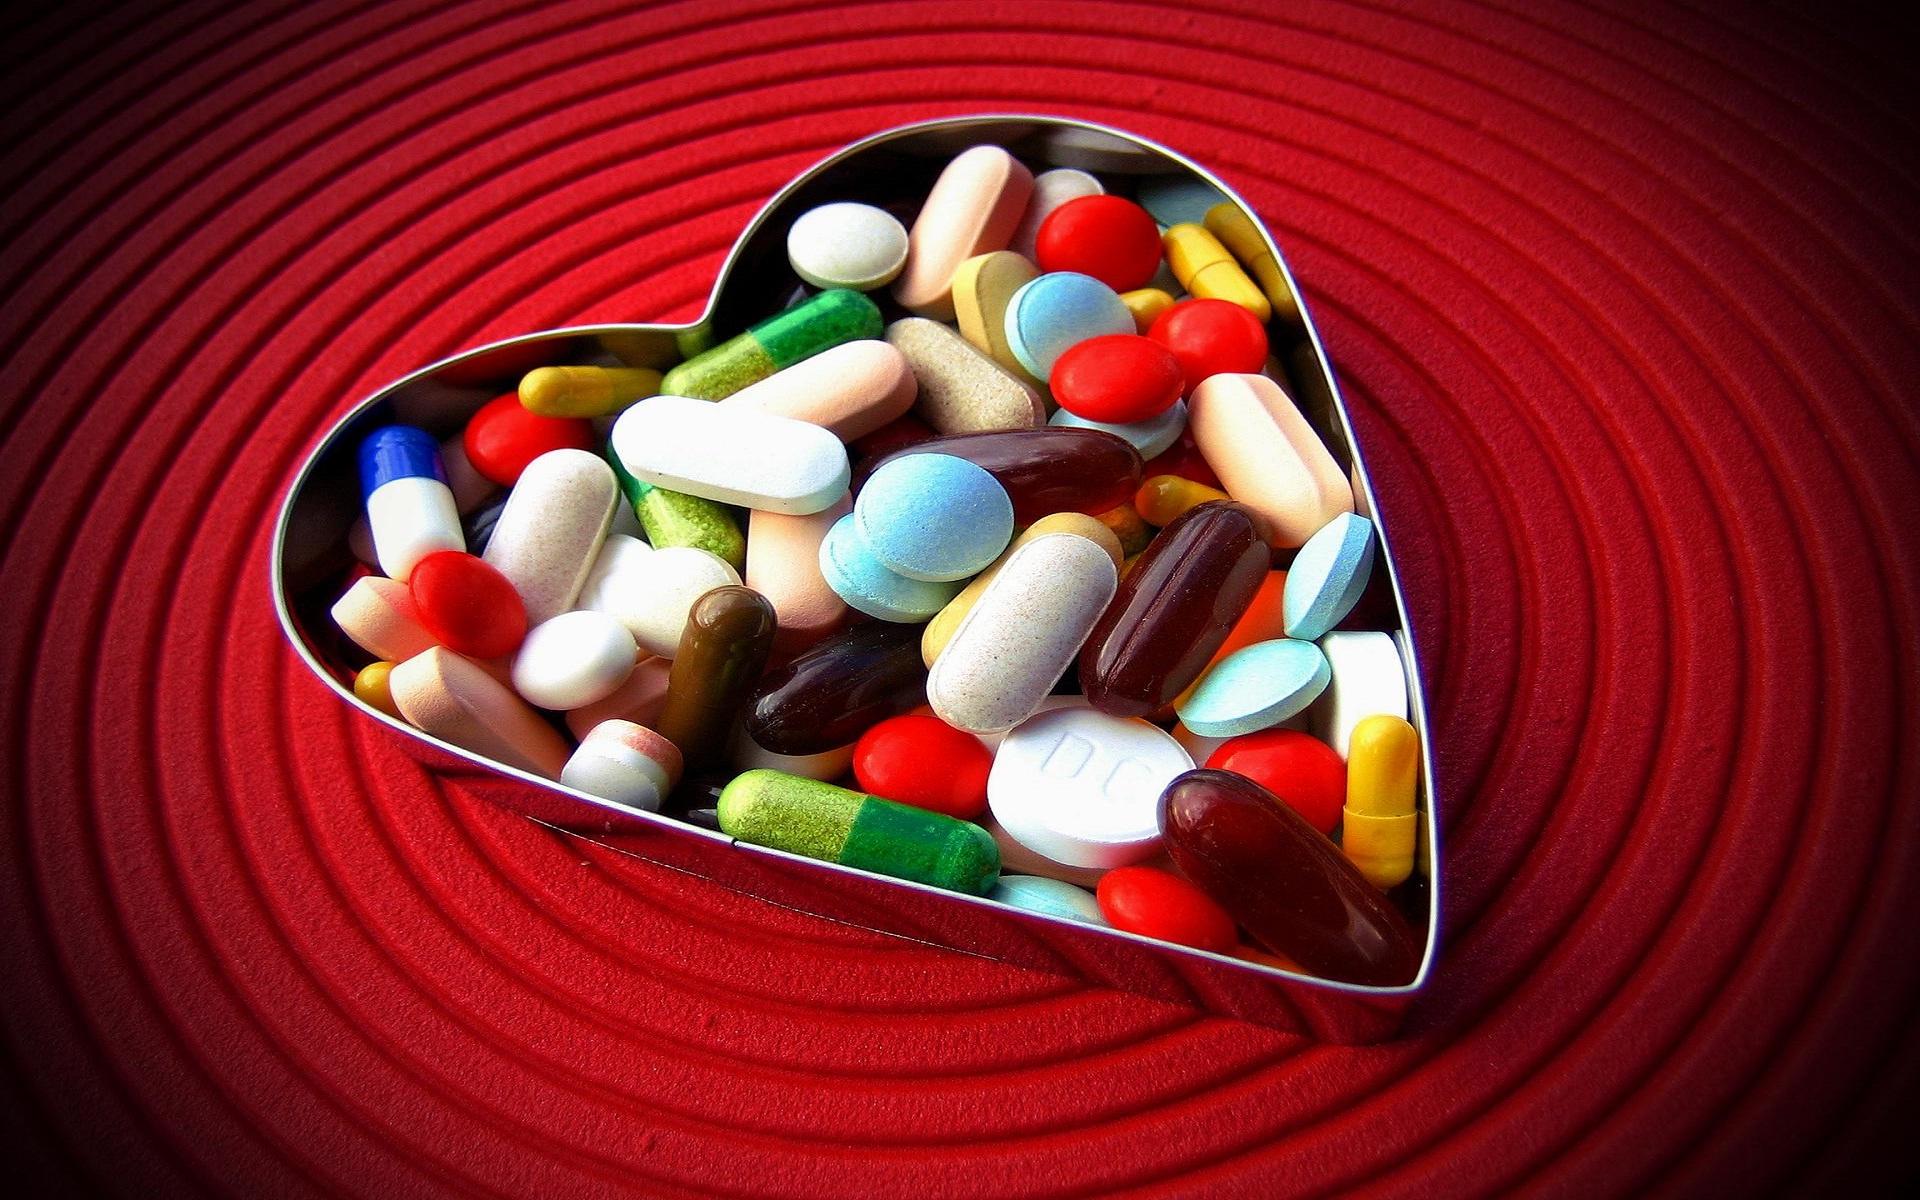 3d Heart Wallpaper Free Download Medicine Wallpapers Hd Free Download Pixelstalk Net